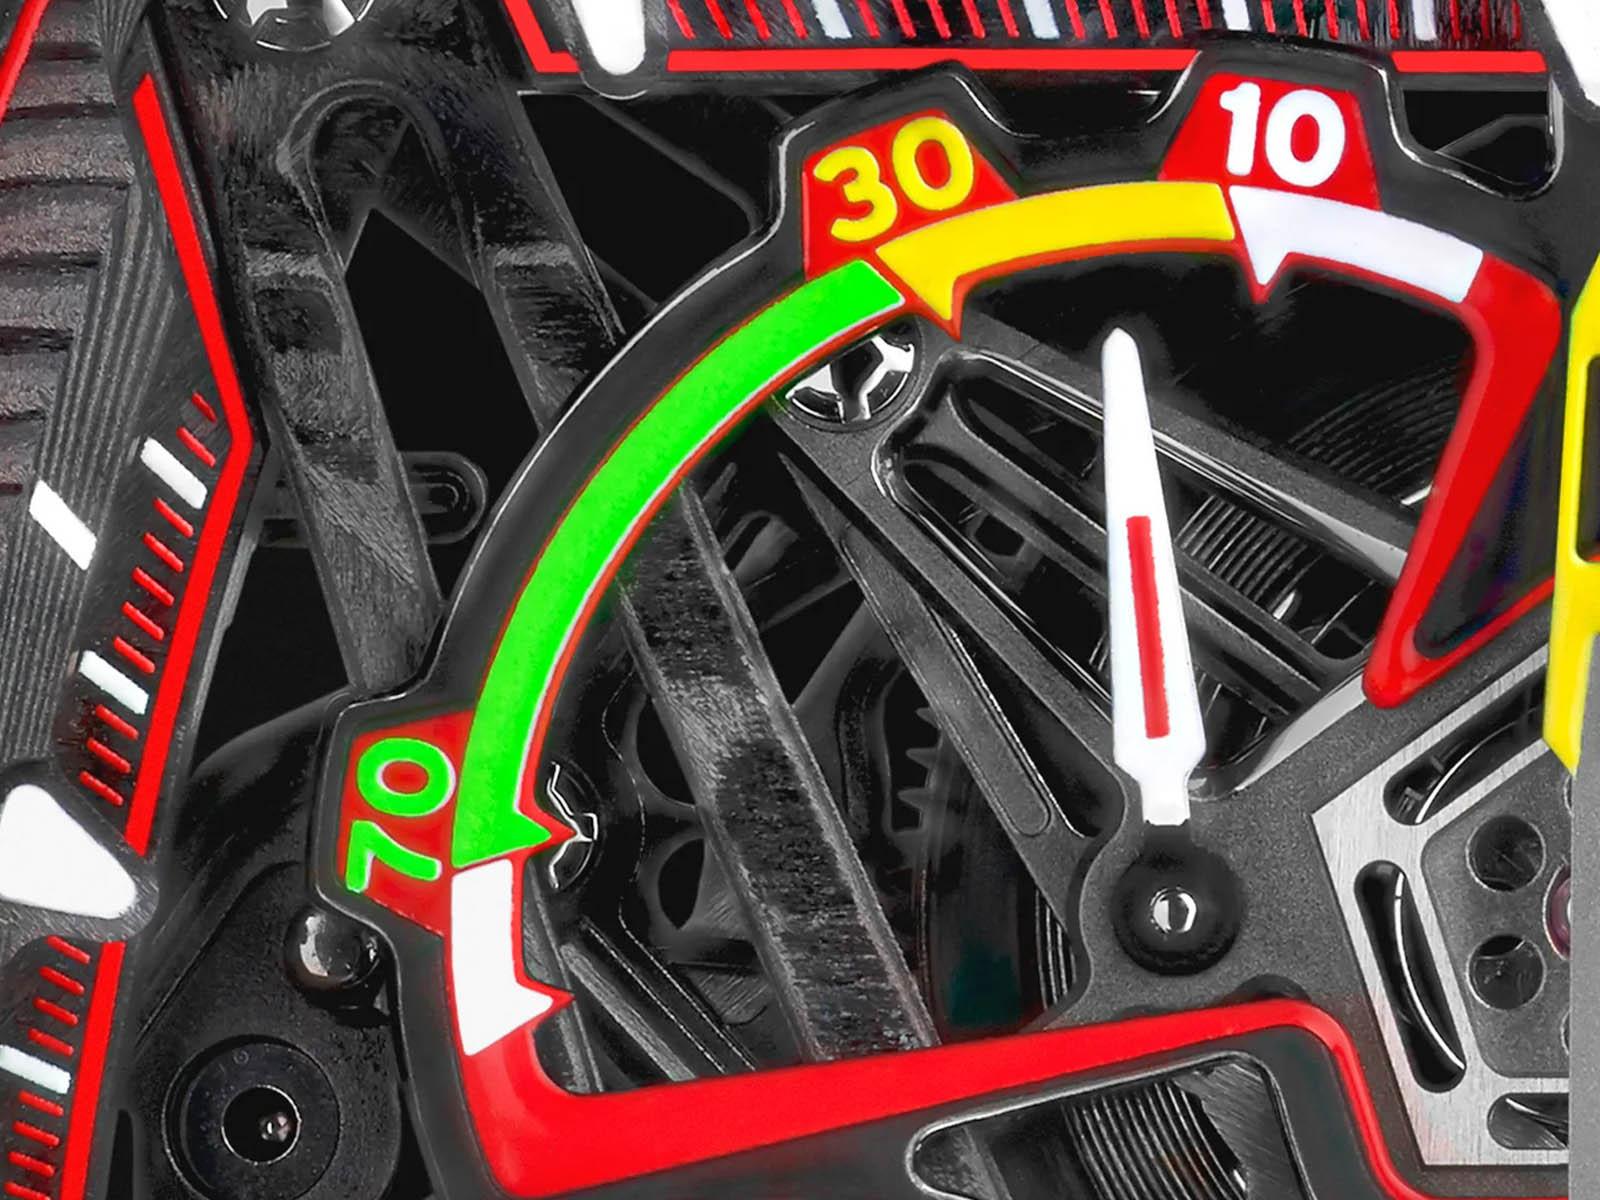 richard-mille-rm-50-04-tourbillon-split-seconds-chronograph-4.jpg